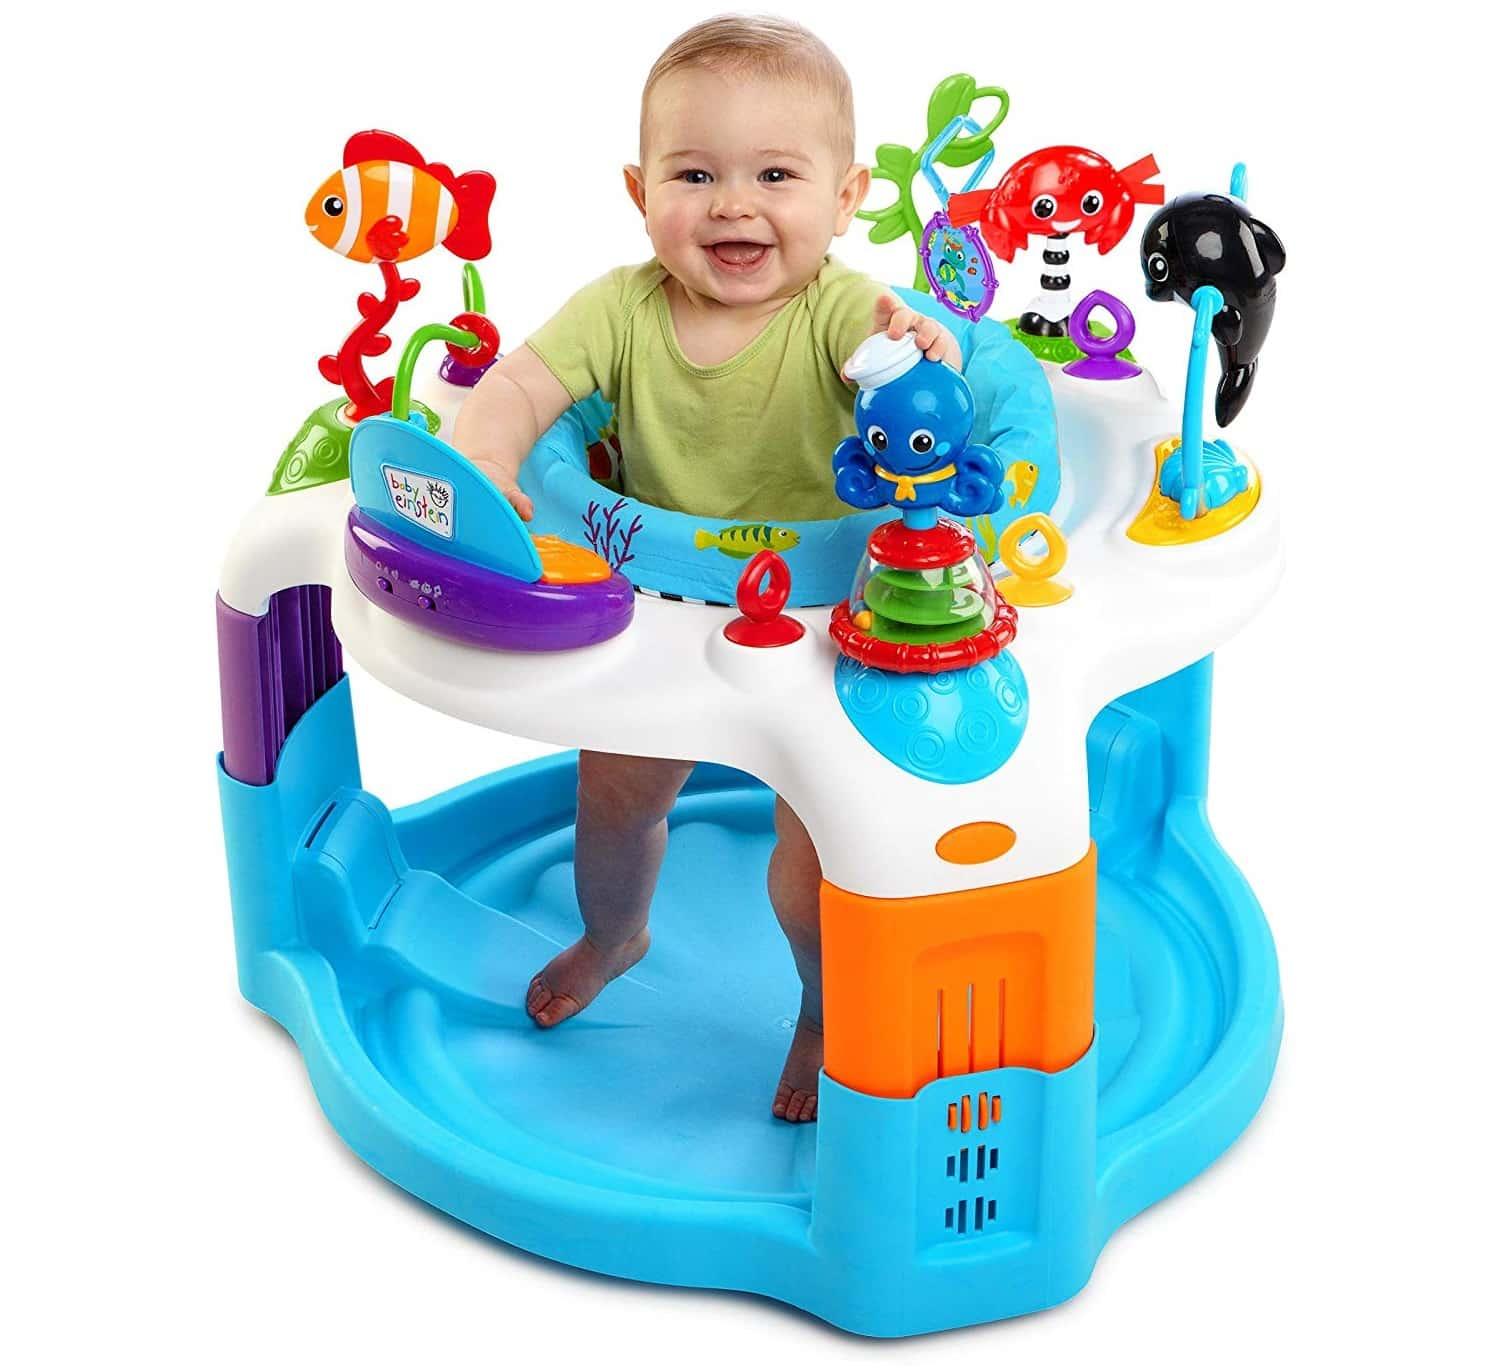 c52d3289dd40 Best Baby Activity Centers